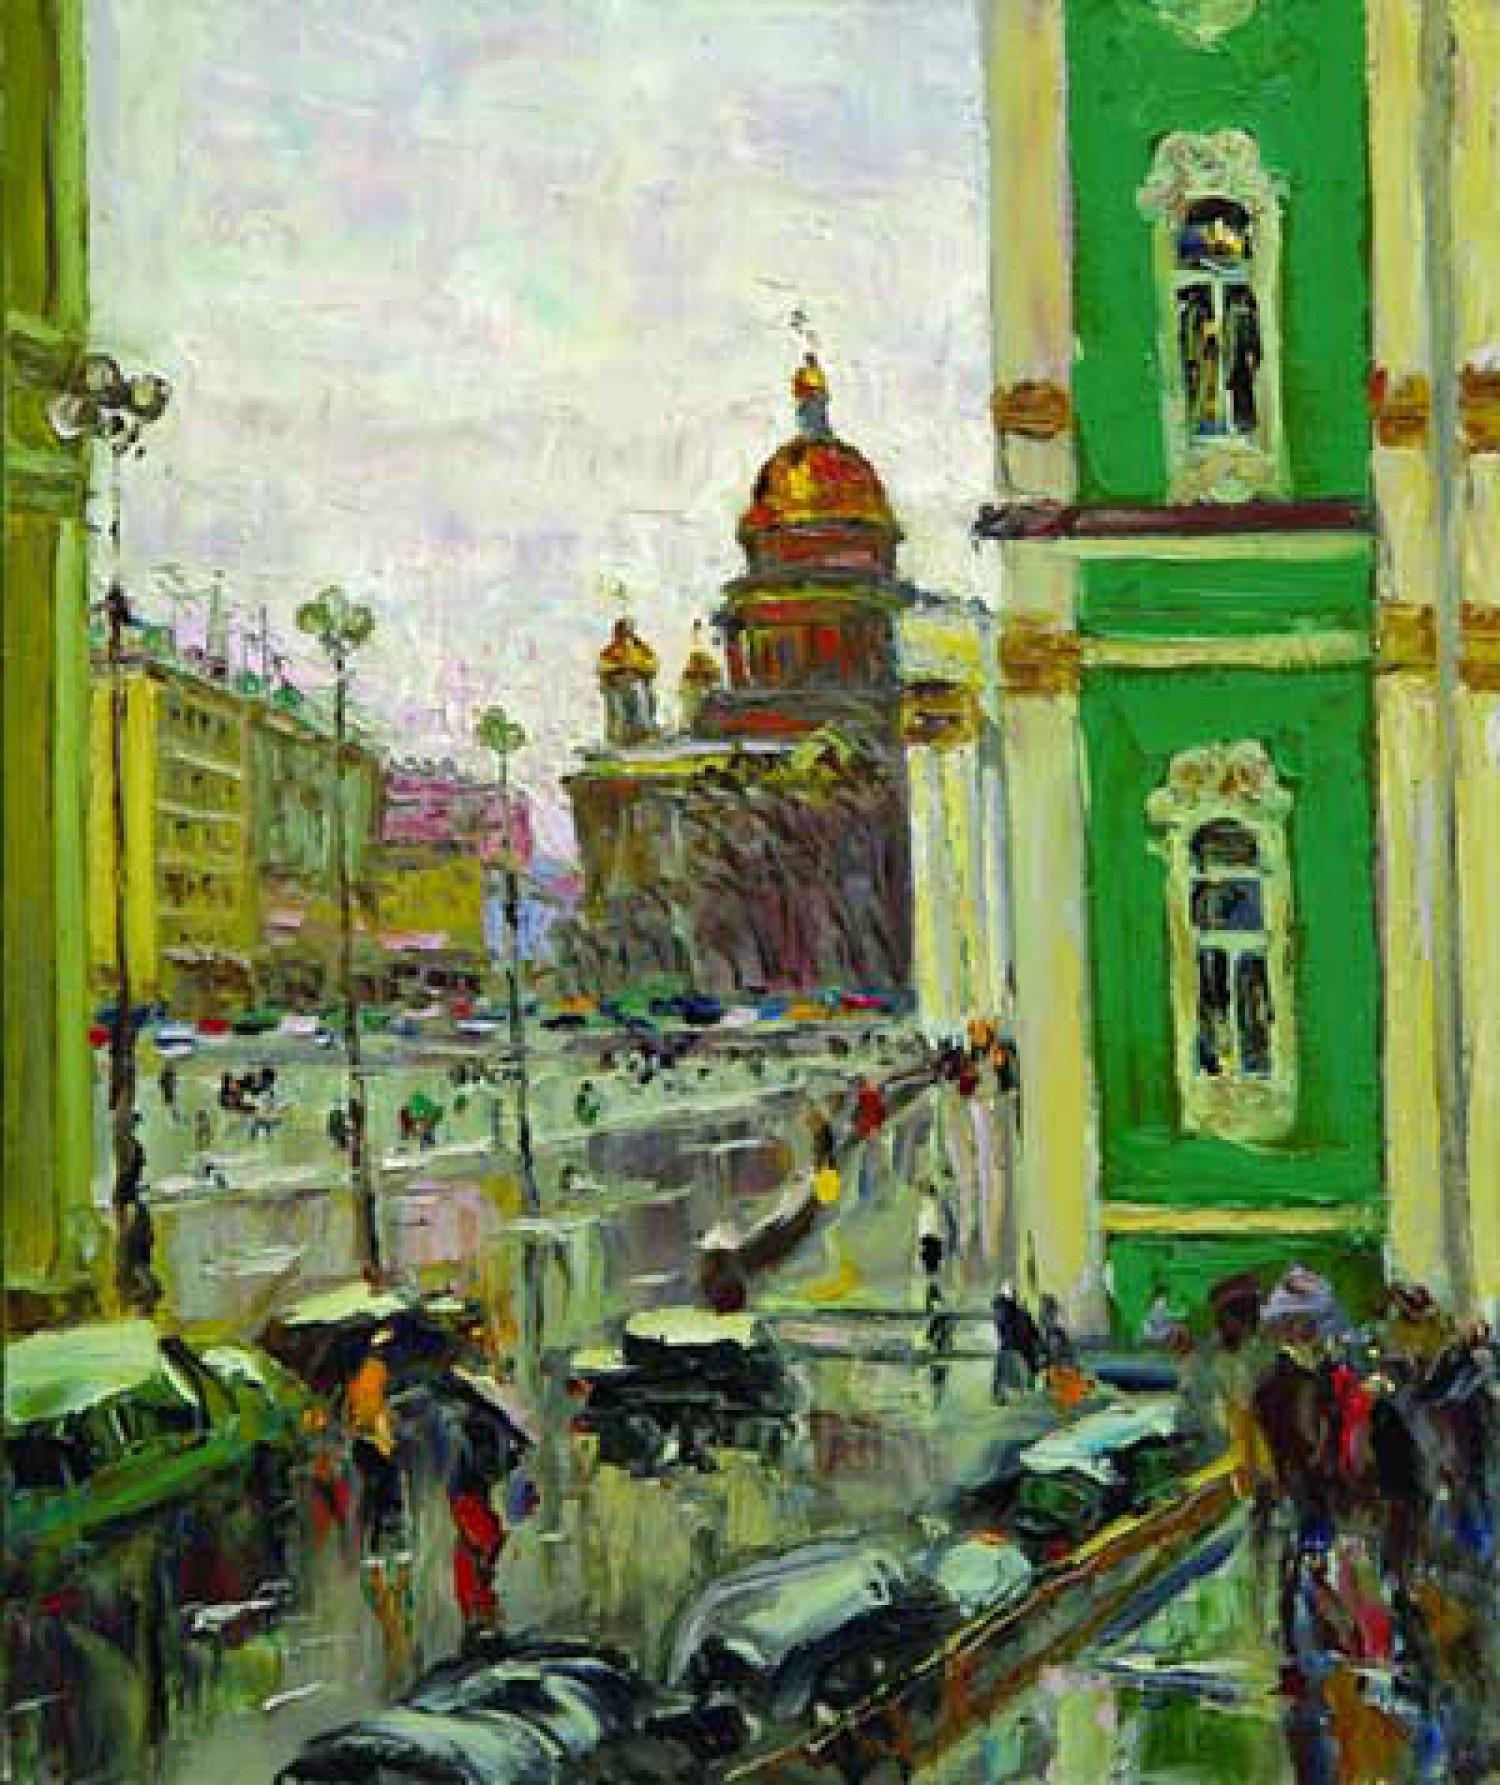 Ю.Д.Жарков. Дождь в Санкт-Петербурге. 2007. 60х50. Х.м. Цена - 50 000 руб.